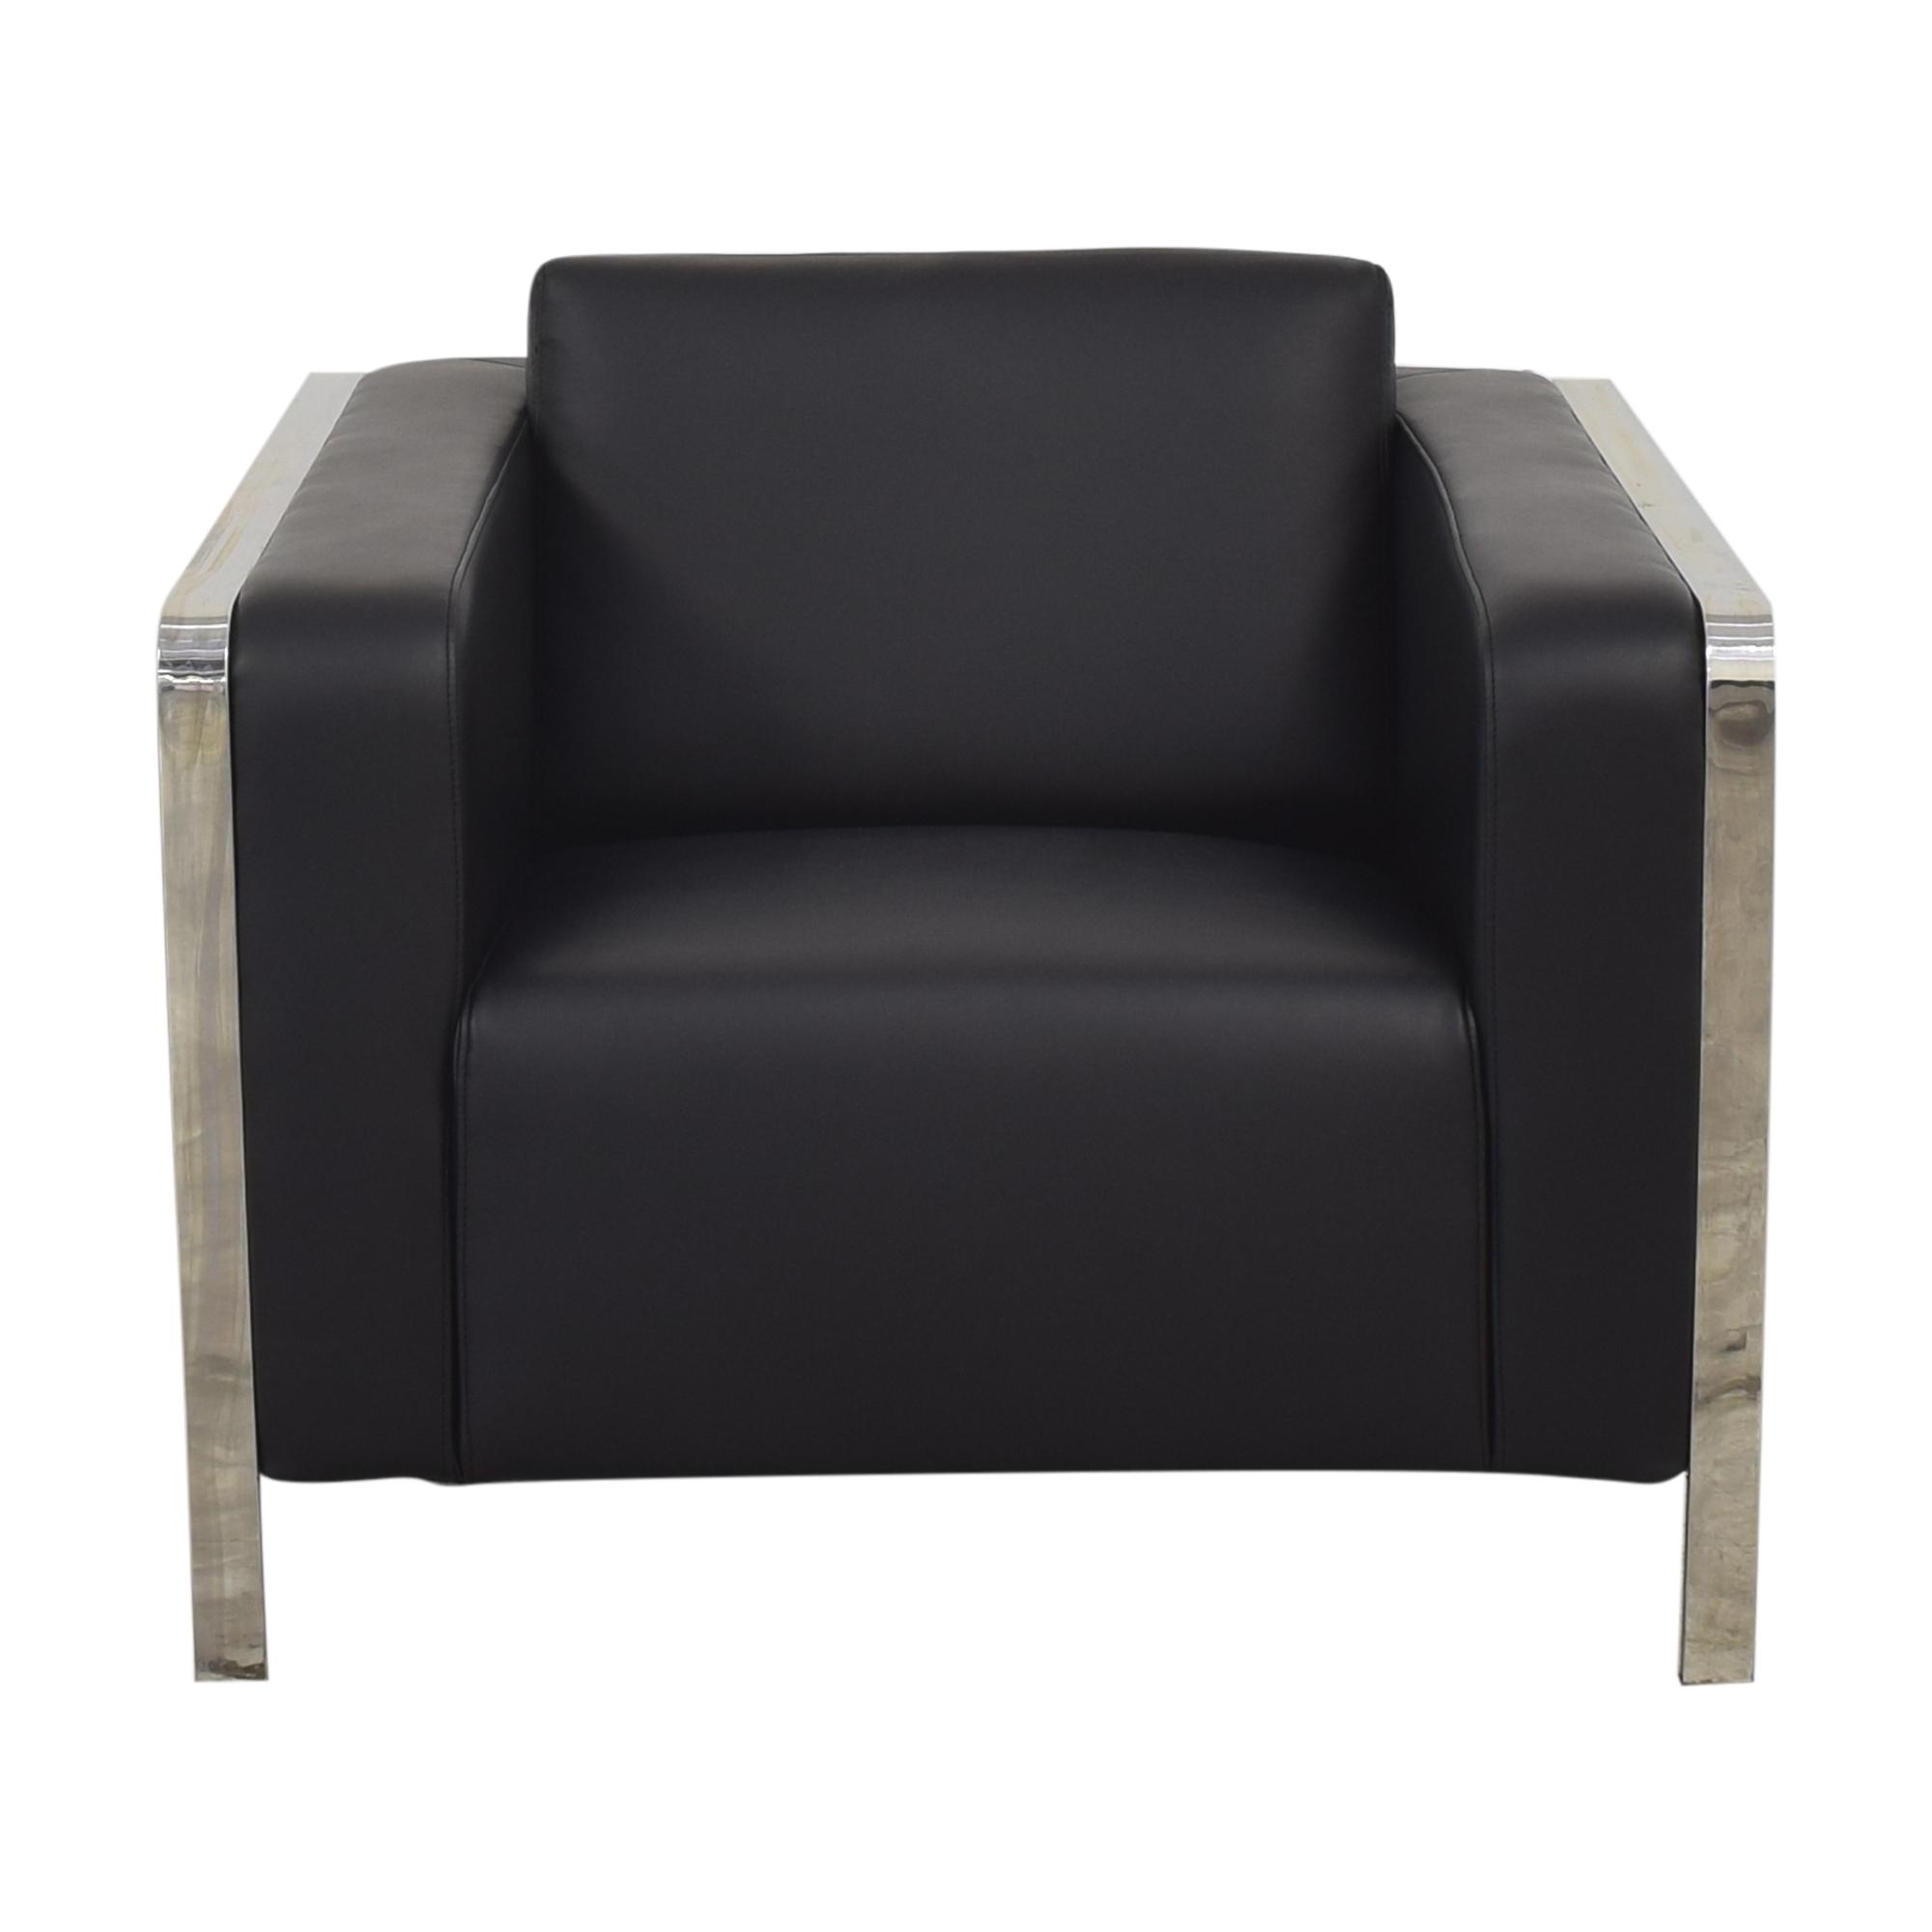 Zuo Modern Zuo Modern Thor Armchair Accent Chairs